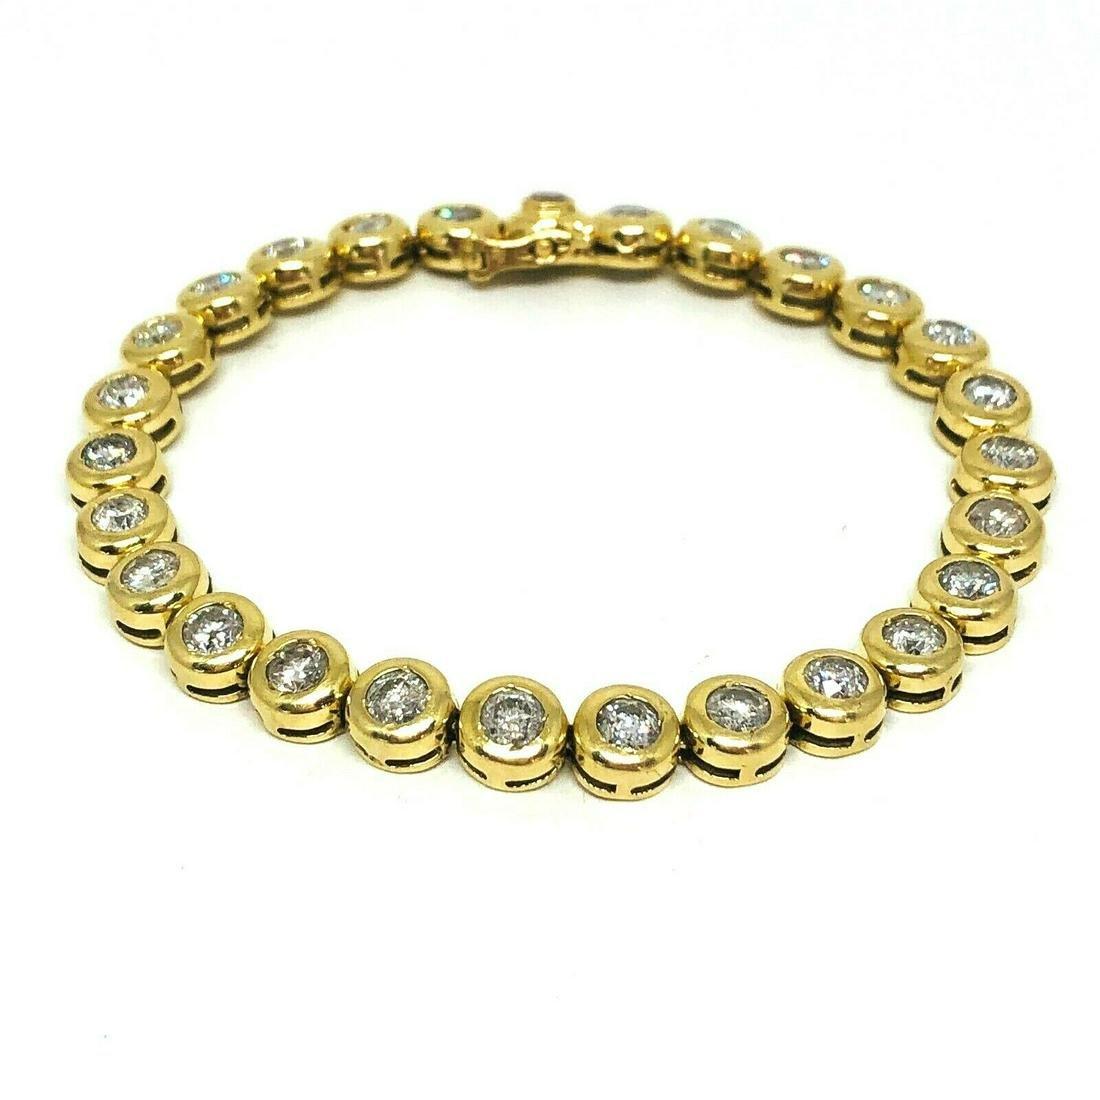 6 ct Round Brilliant Cut Diamond Tennis Bracelet 14K